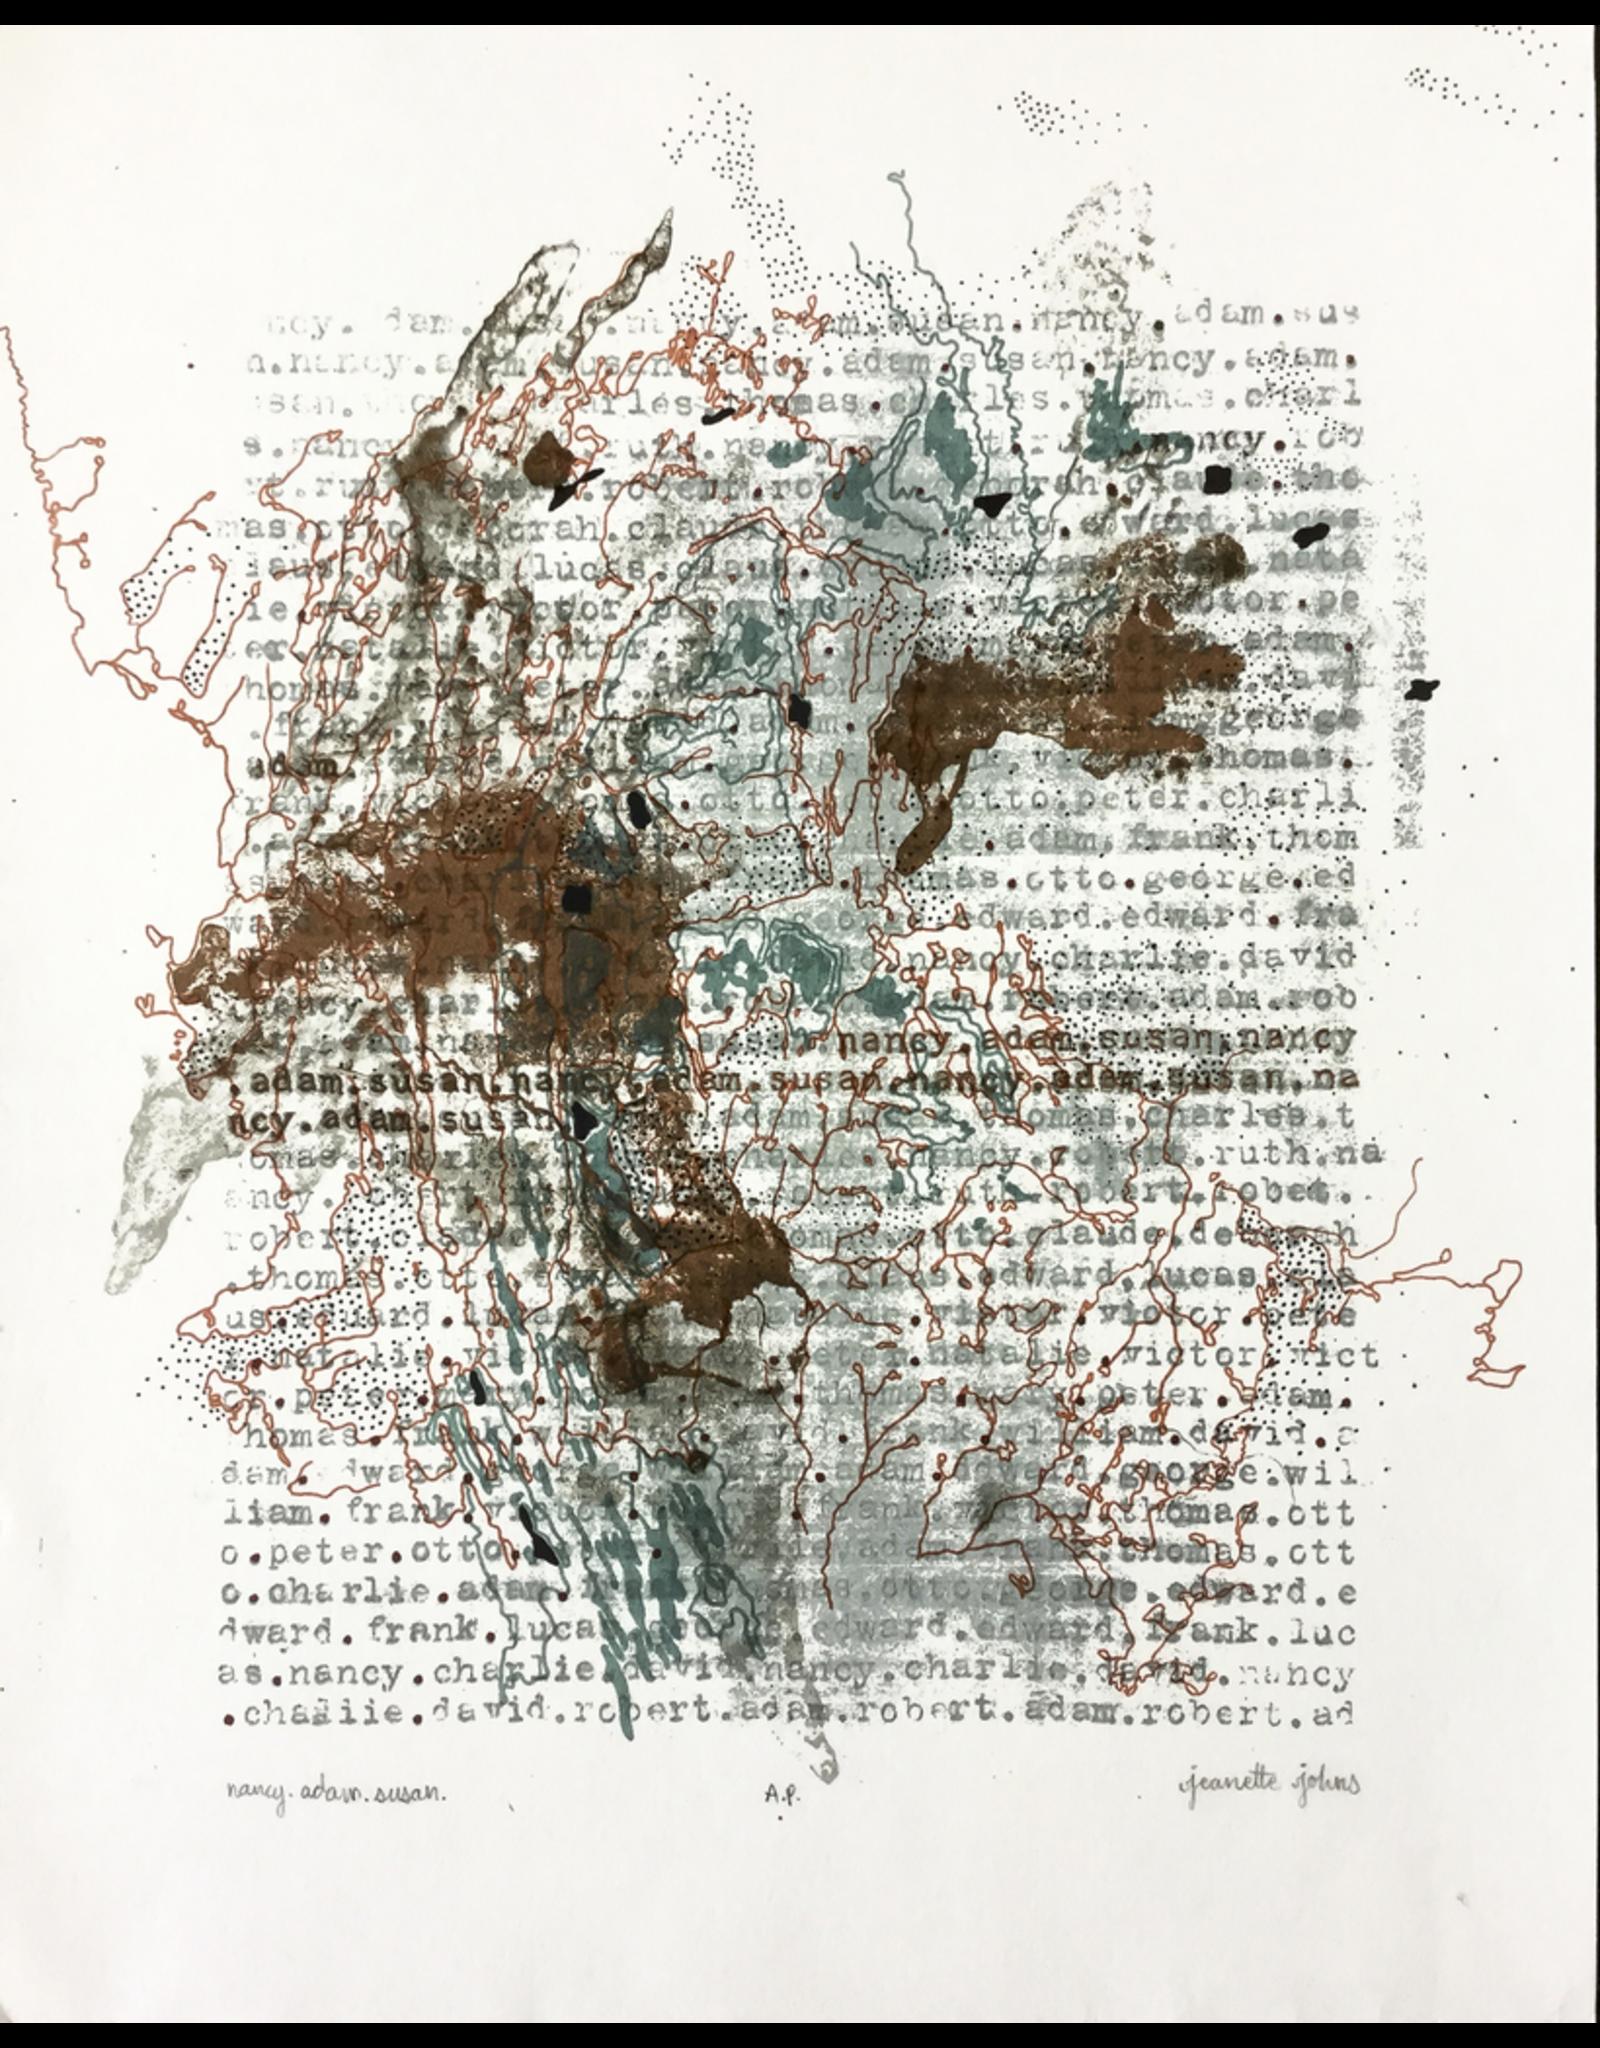 Johns, Jeanette nancy.adam.susan Jeanette Johns Medium: Screenprint, Handwork Year: 2008 Artist Proof Image Height (in): 12.25 Image Width (in): 11 Paper Height (in): 14 Paper Width (in): 11  I